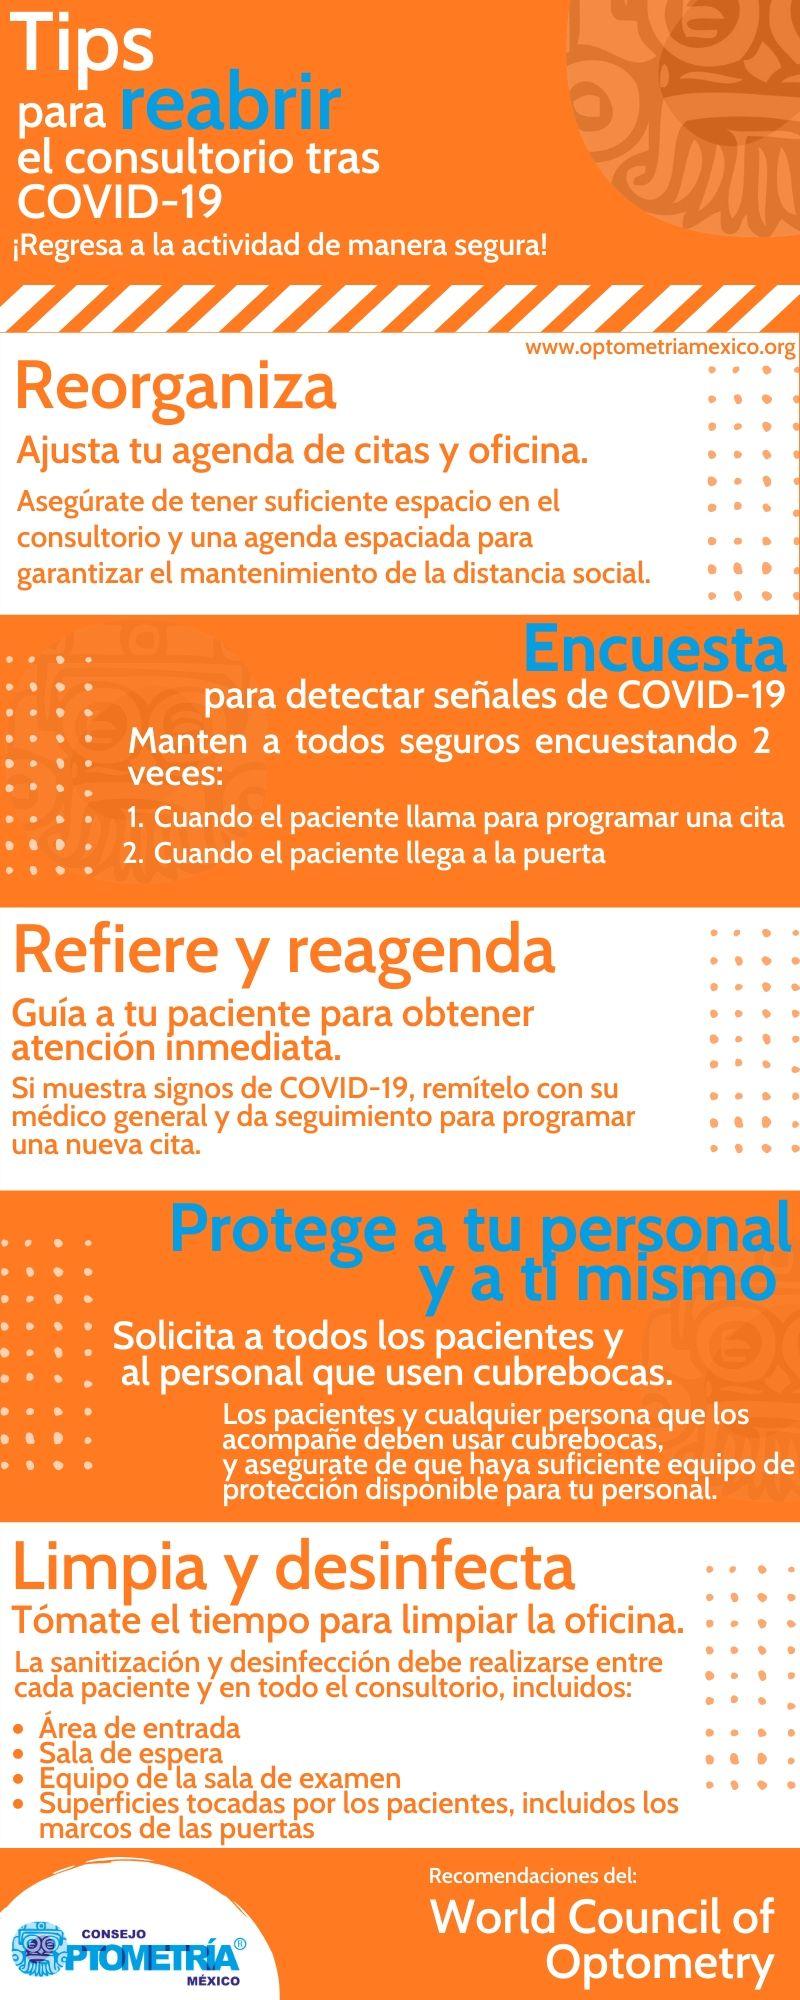 Tips_Reabrir_Consultorio_COVID19_Consejo_Optometría_México-min